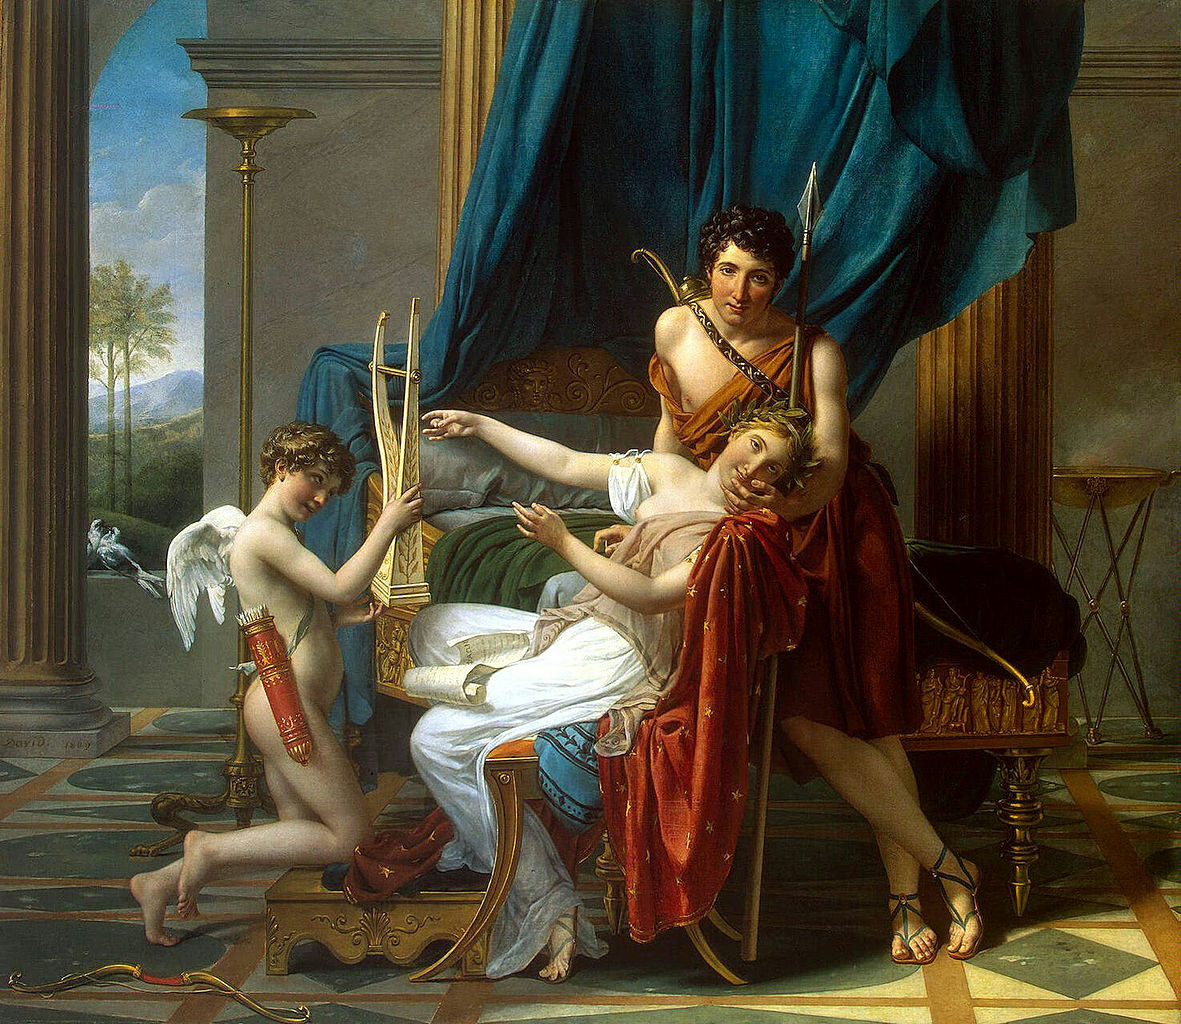 Who was Sappho